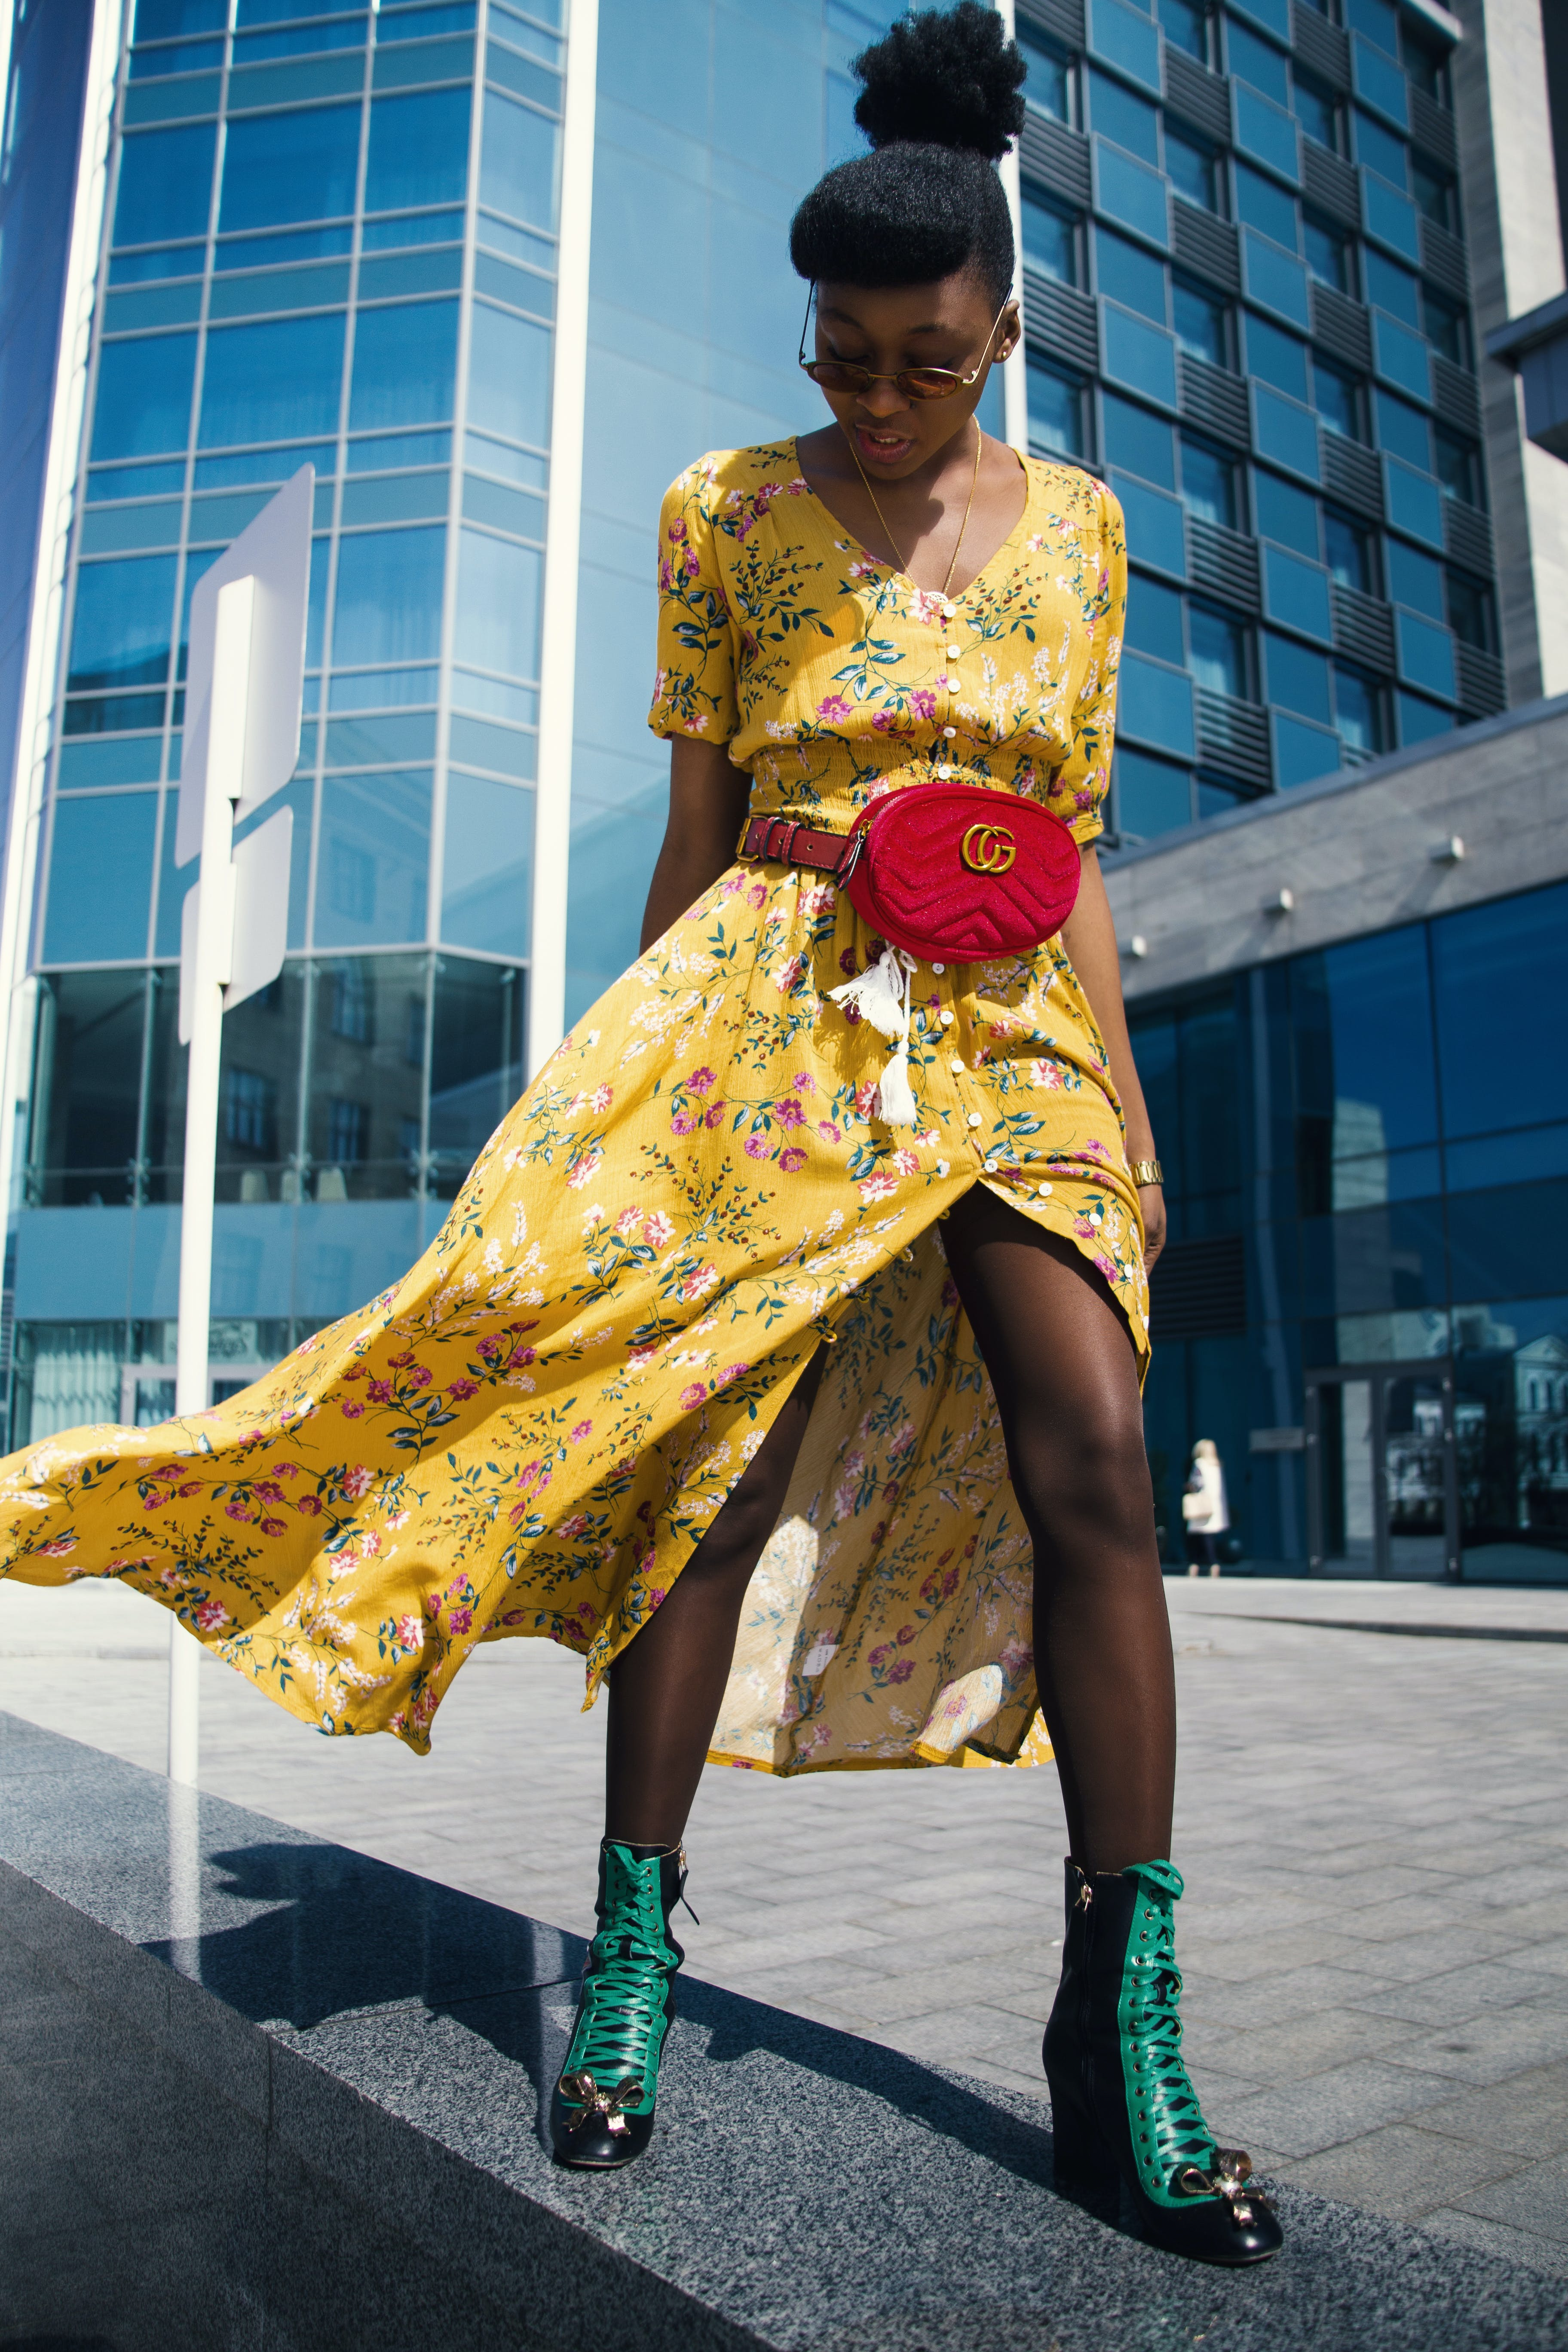 Základová fotografie zdarma na téma afroameričanka, budova, černá holka, černoška